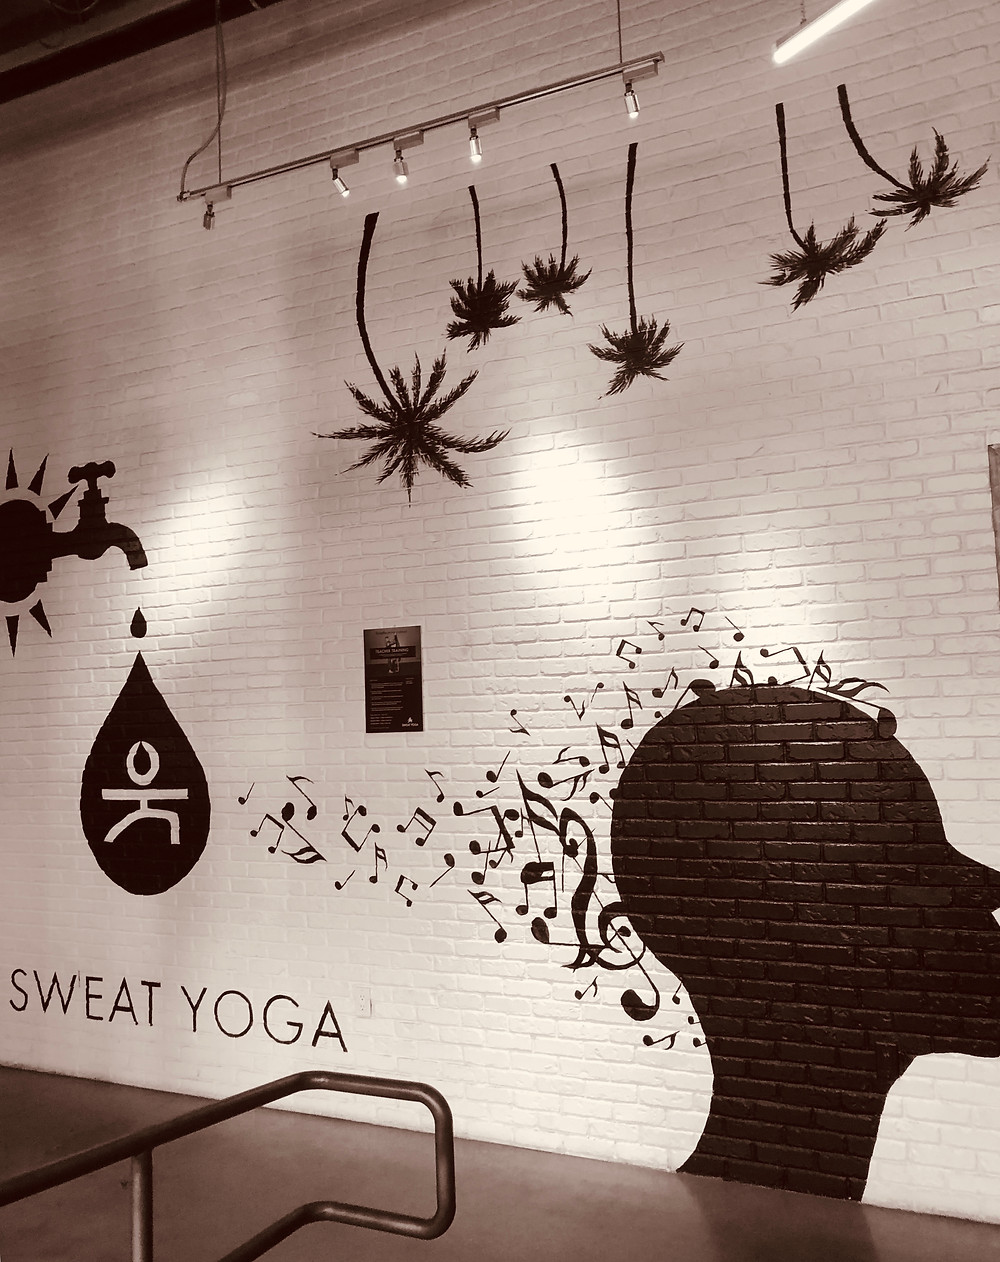 Sweatyoga studio Santa Monica, Los Angeles yoga studio, Sweat Yoga graffiti wall